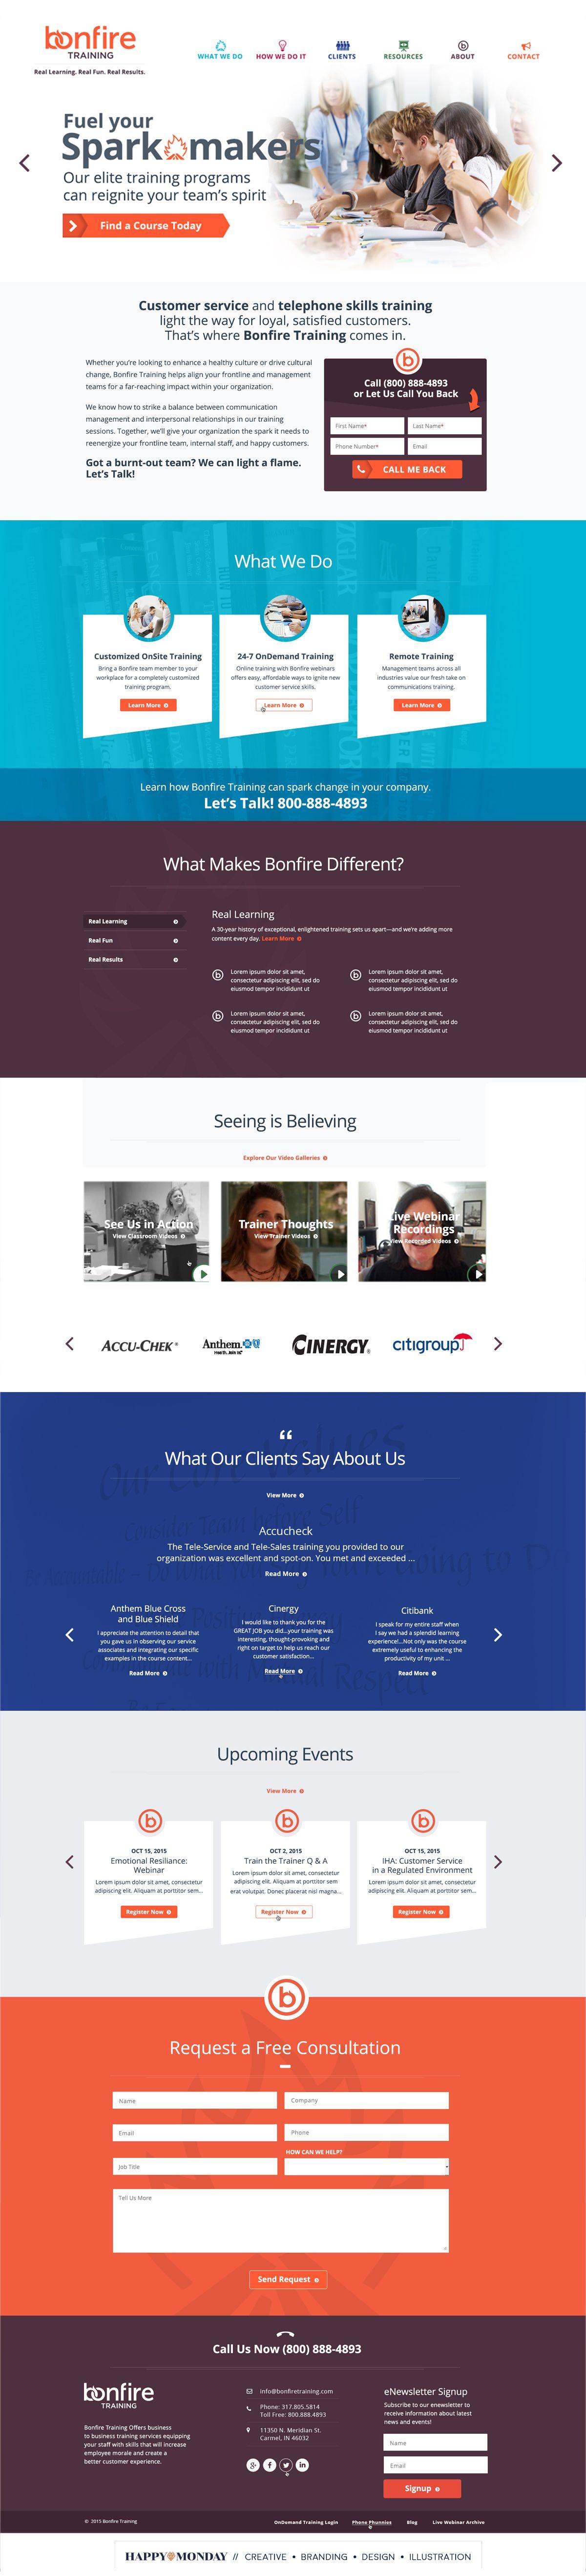 Website Design For B2b Corporate Call Center Trainers Skills In 2020 Web Design Customer Service Training Wordpress Theme Responsive